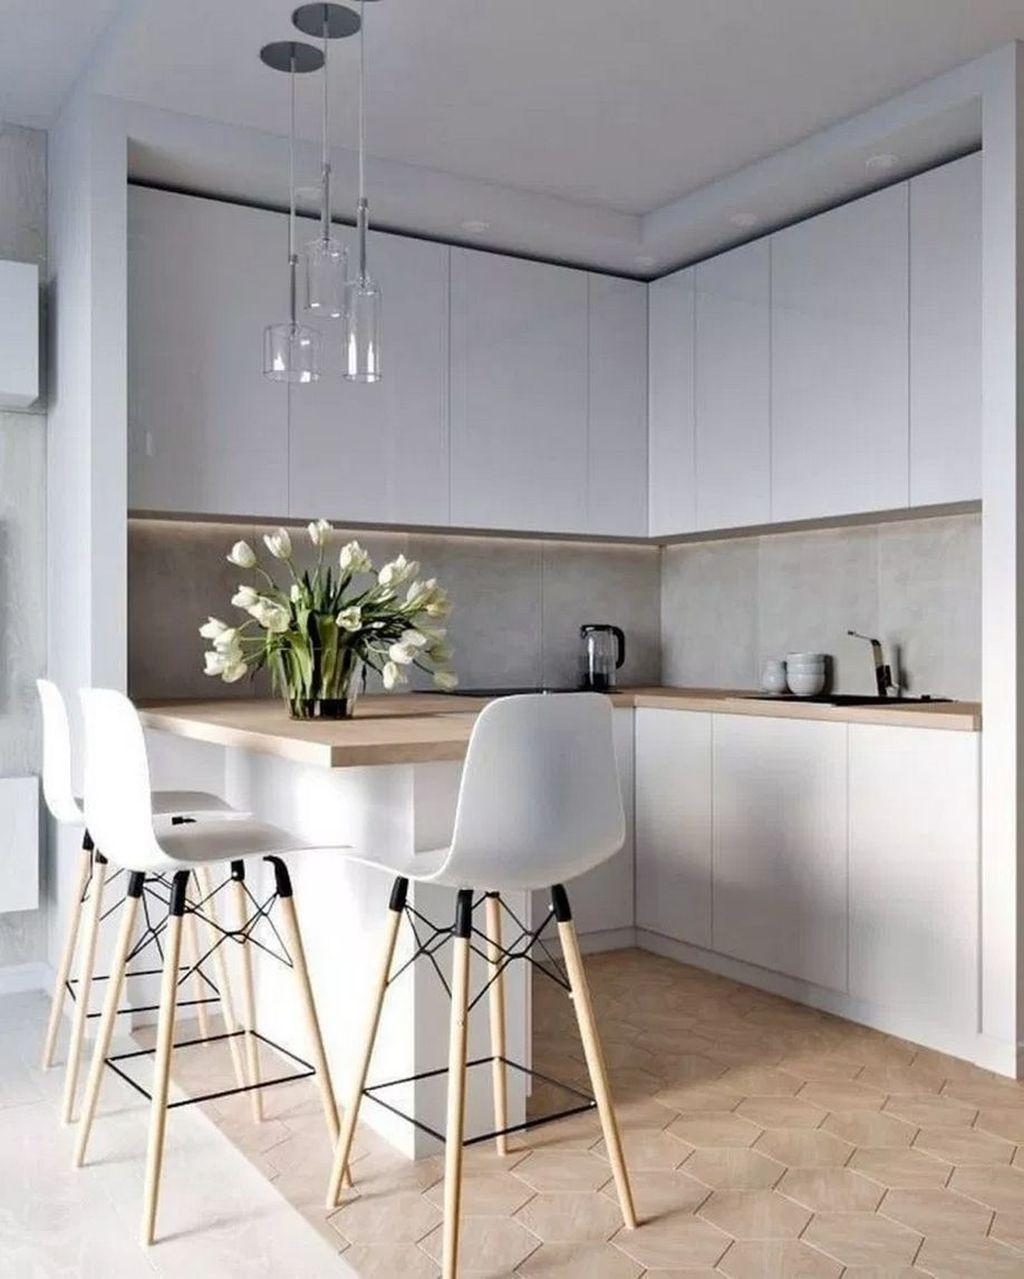 38 Elegant Kitchen Design Ideas For Small House To Copy